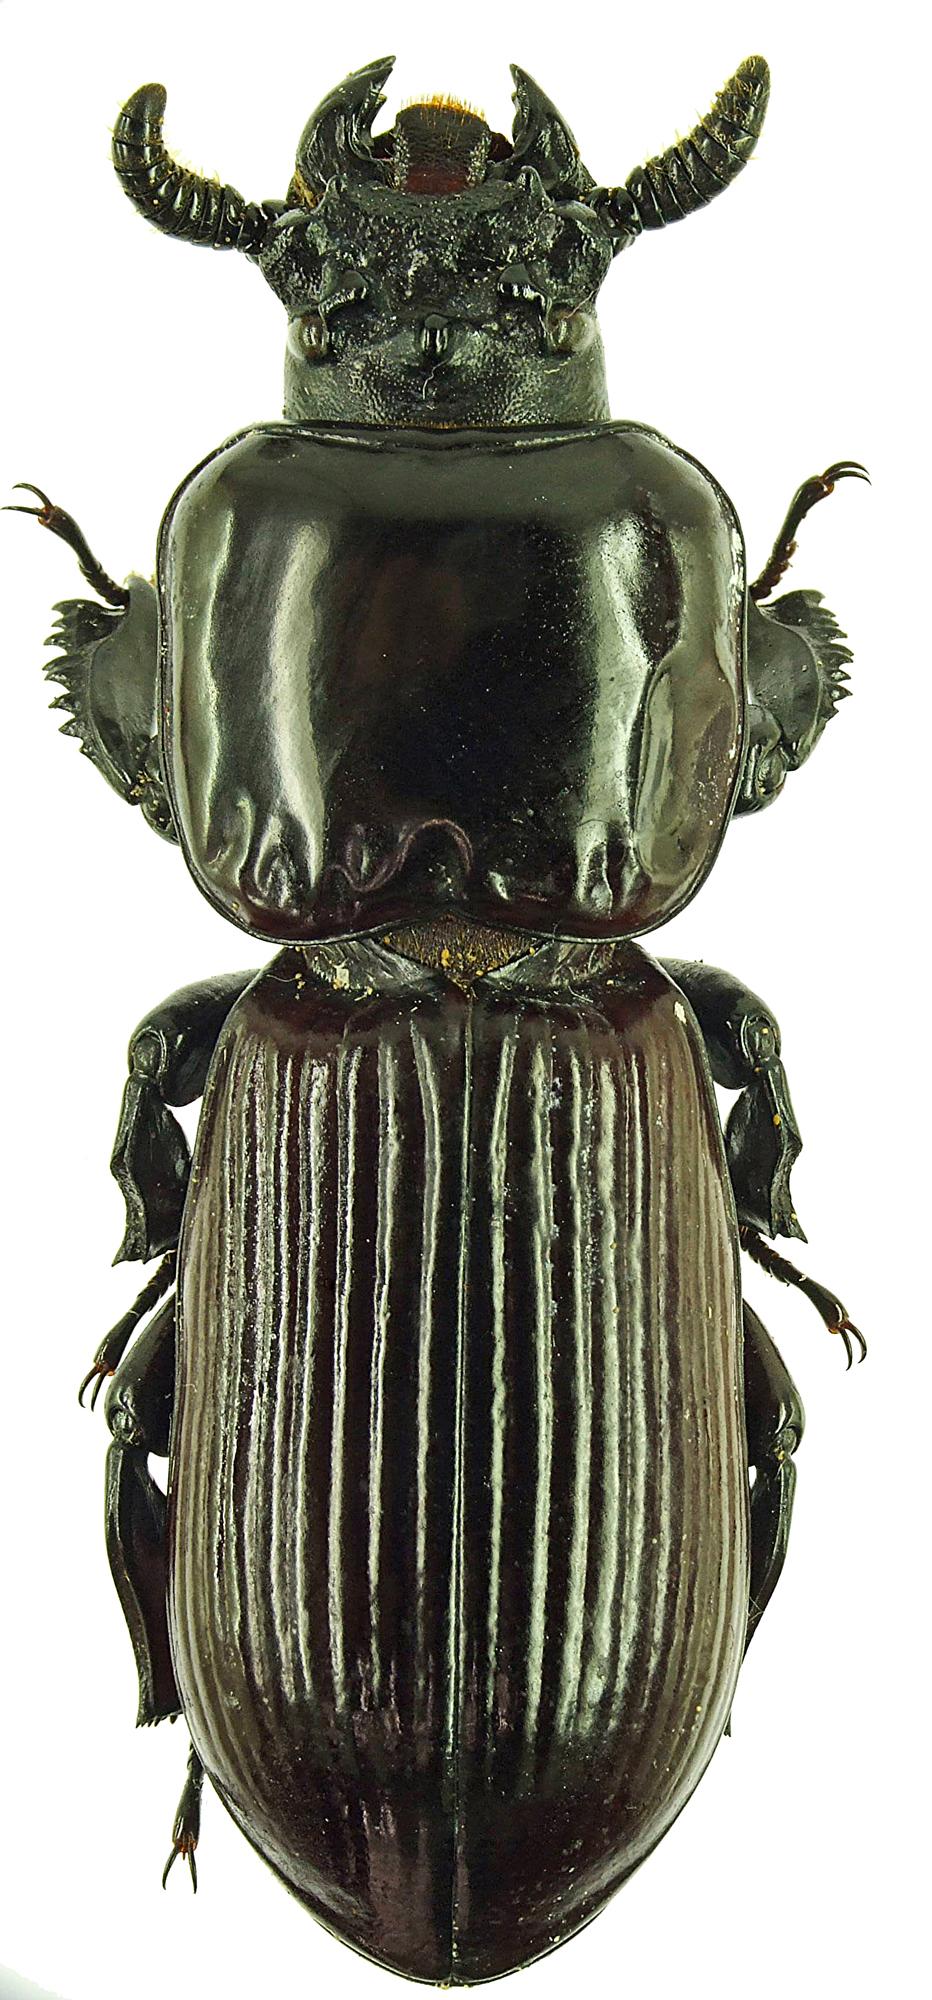 Prioproctus oertzeni 23791cz93.jpg